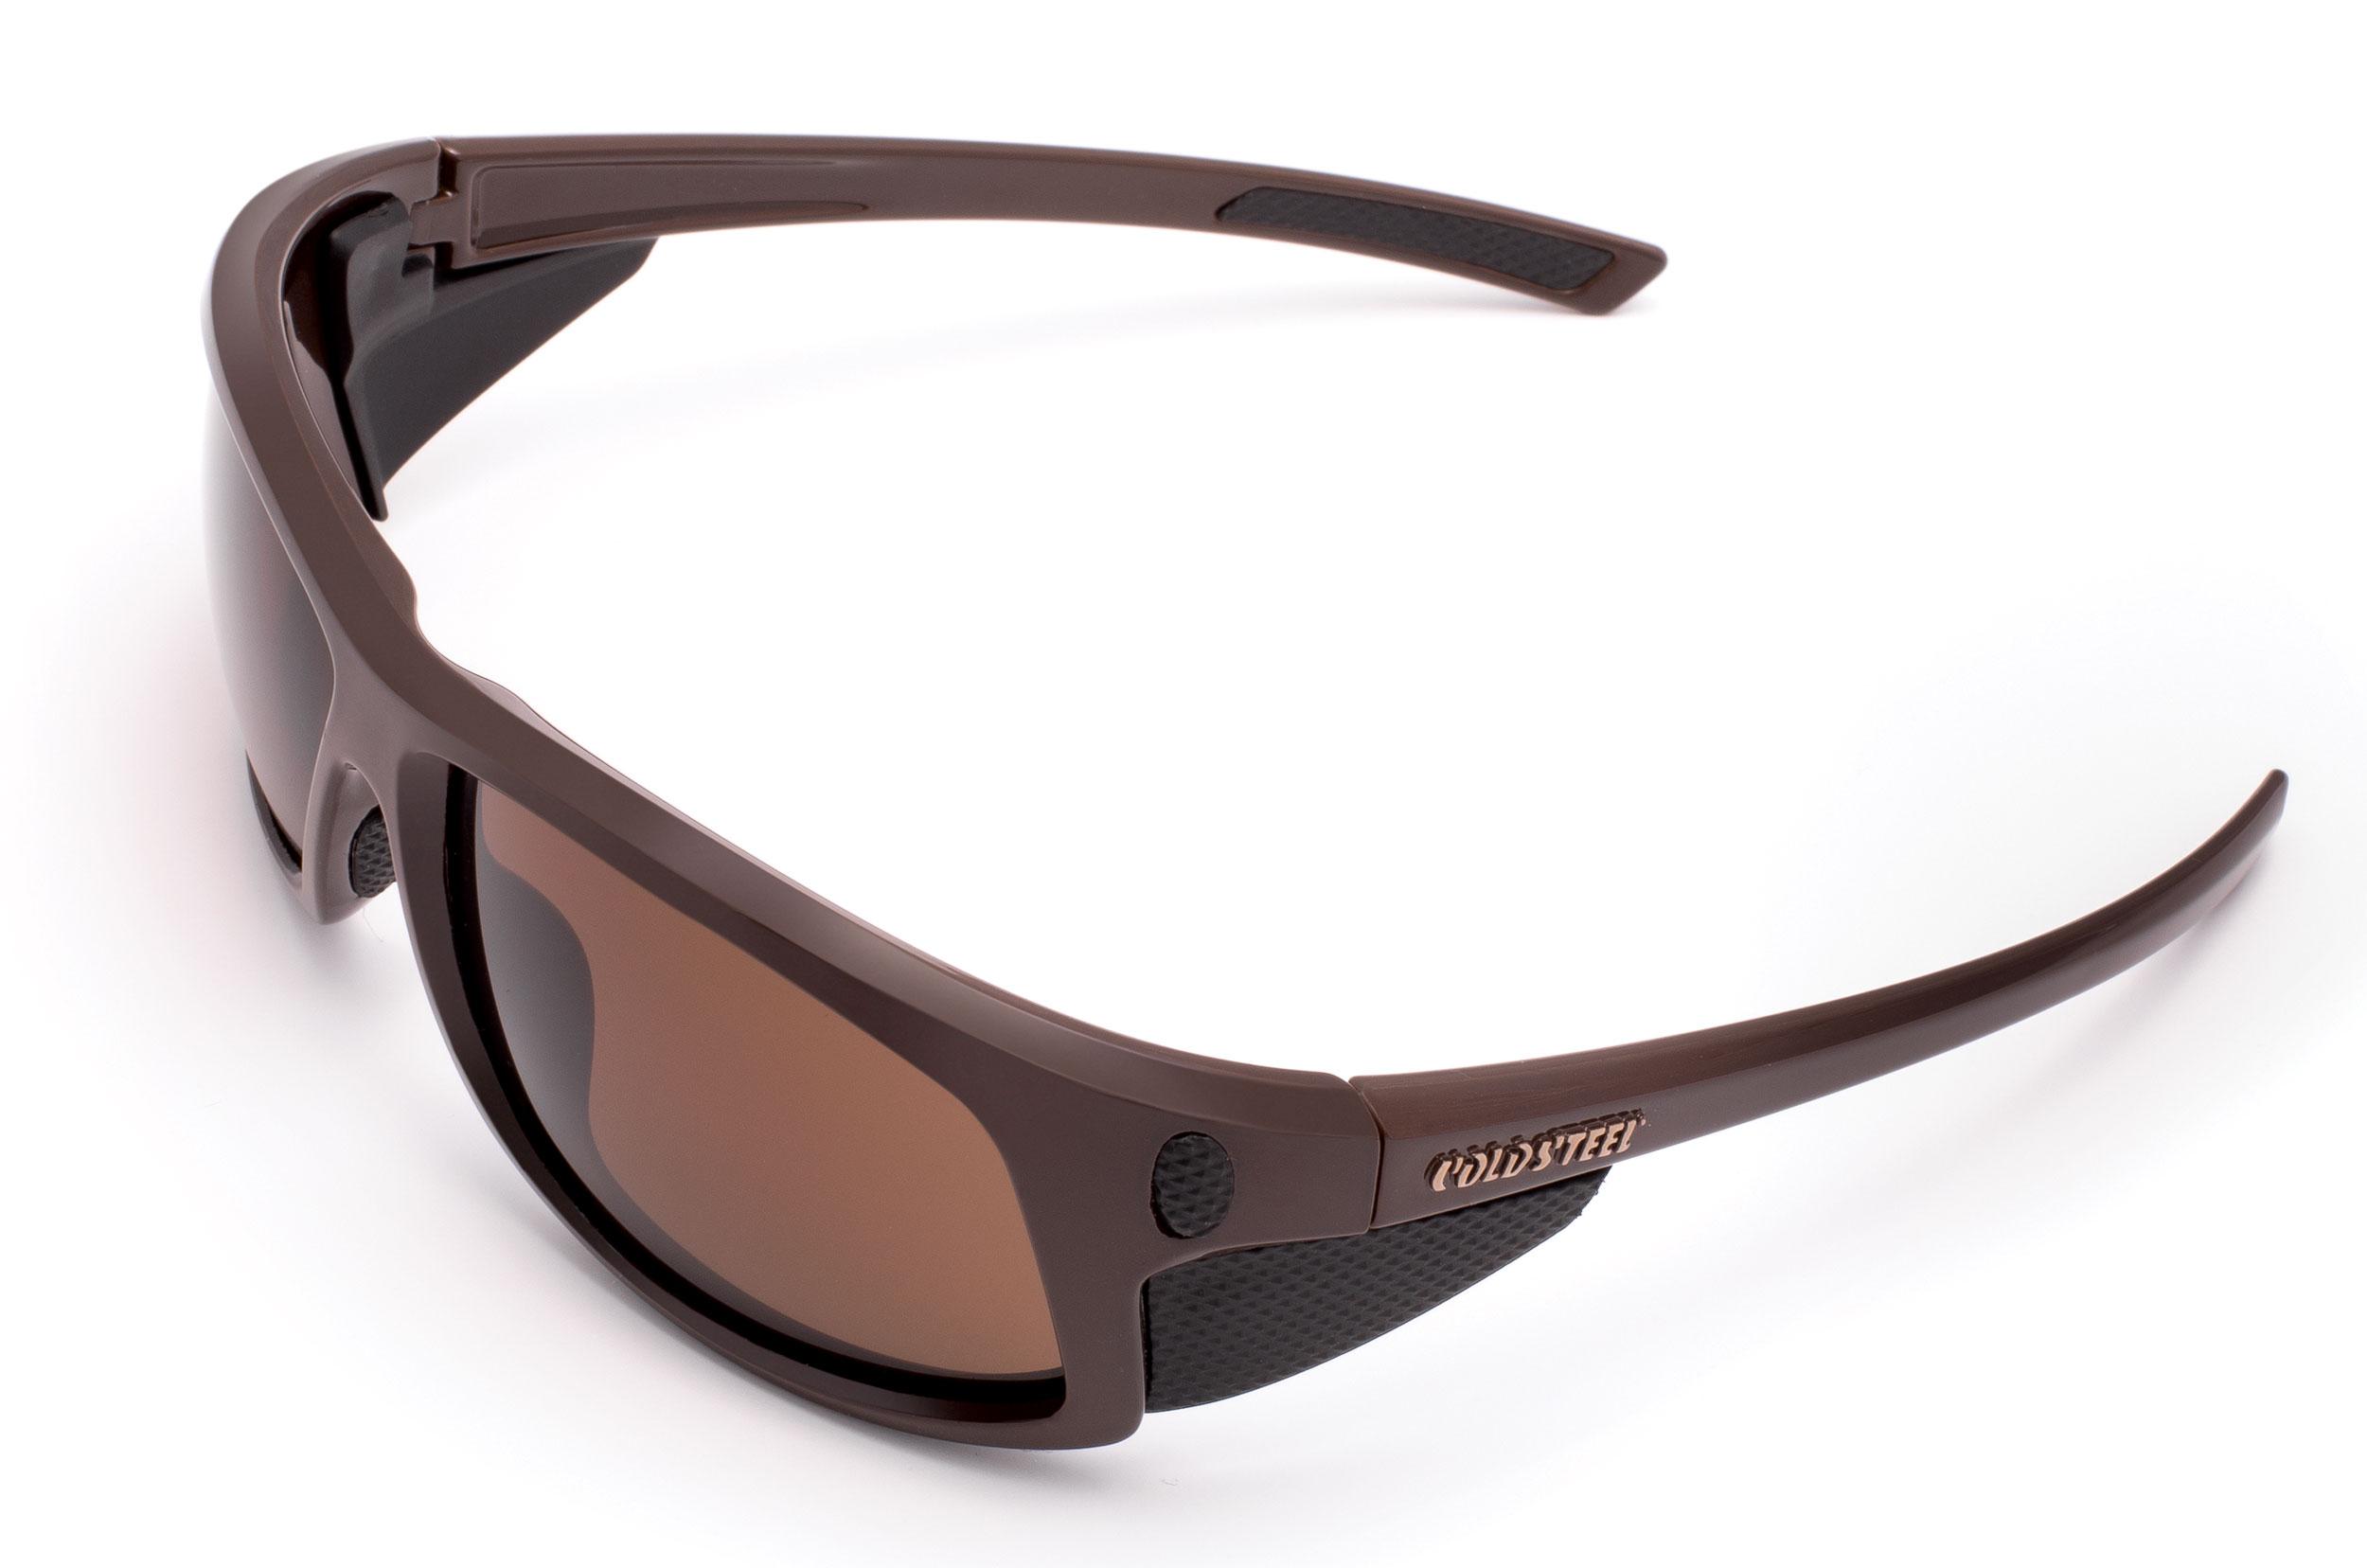 Cold Steel EW13M Battle Shades Mark-I Eyewear, Matte Brown Sunglasses